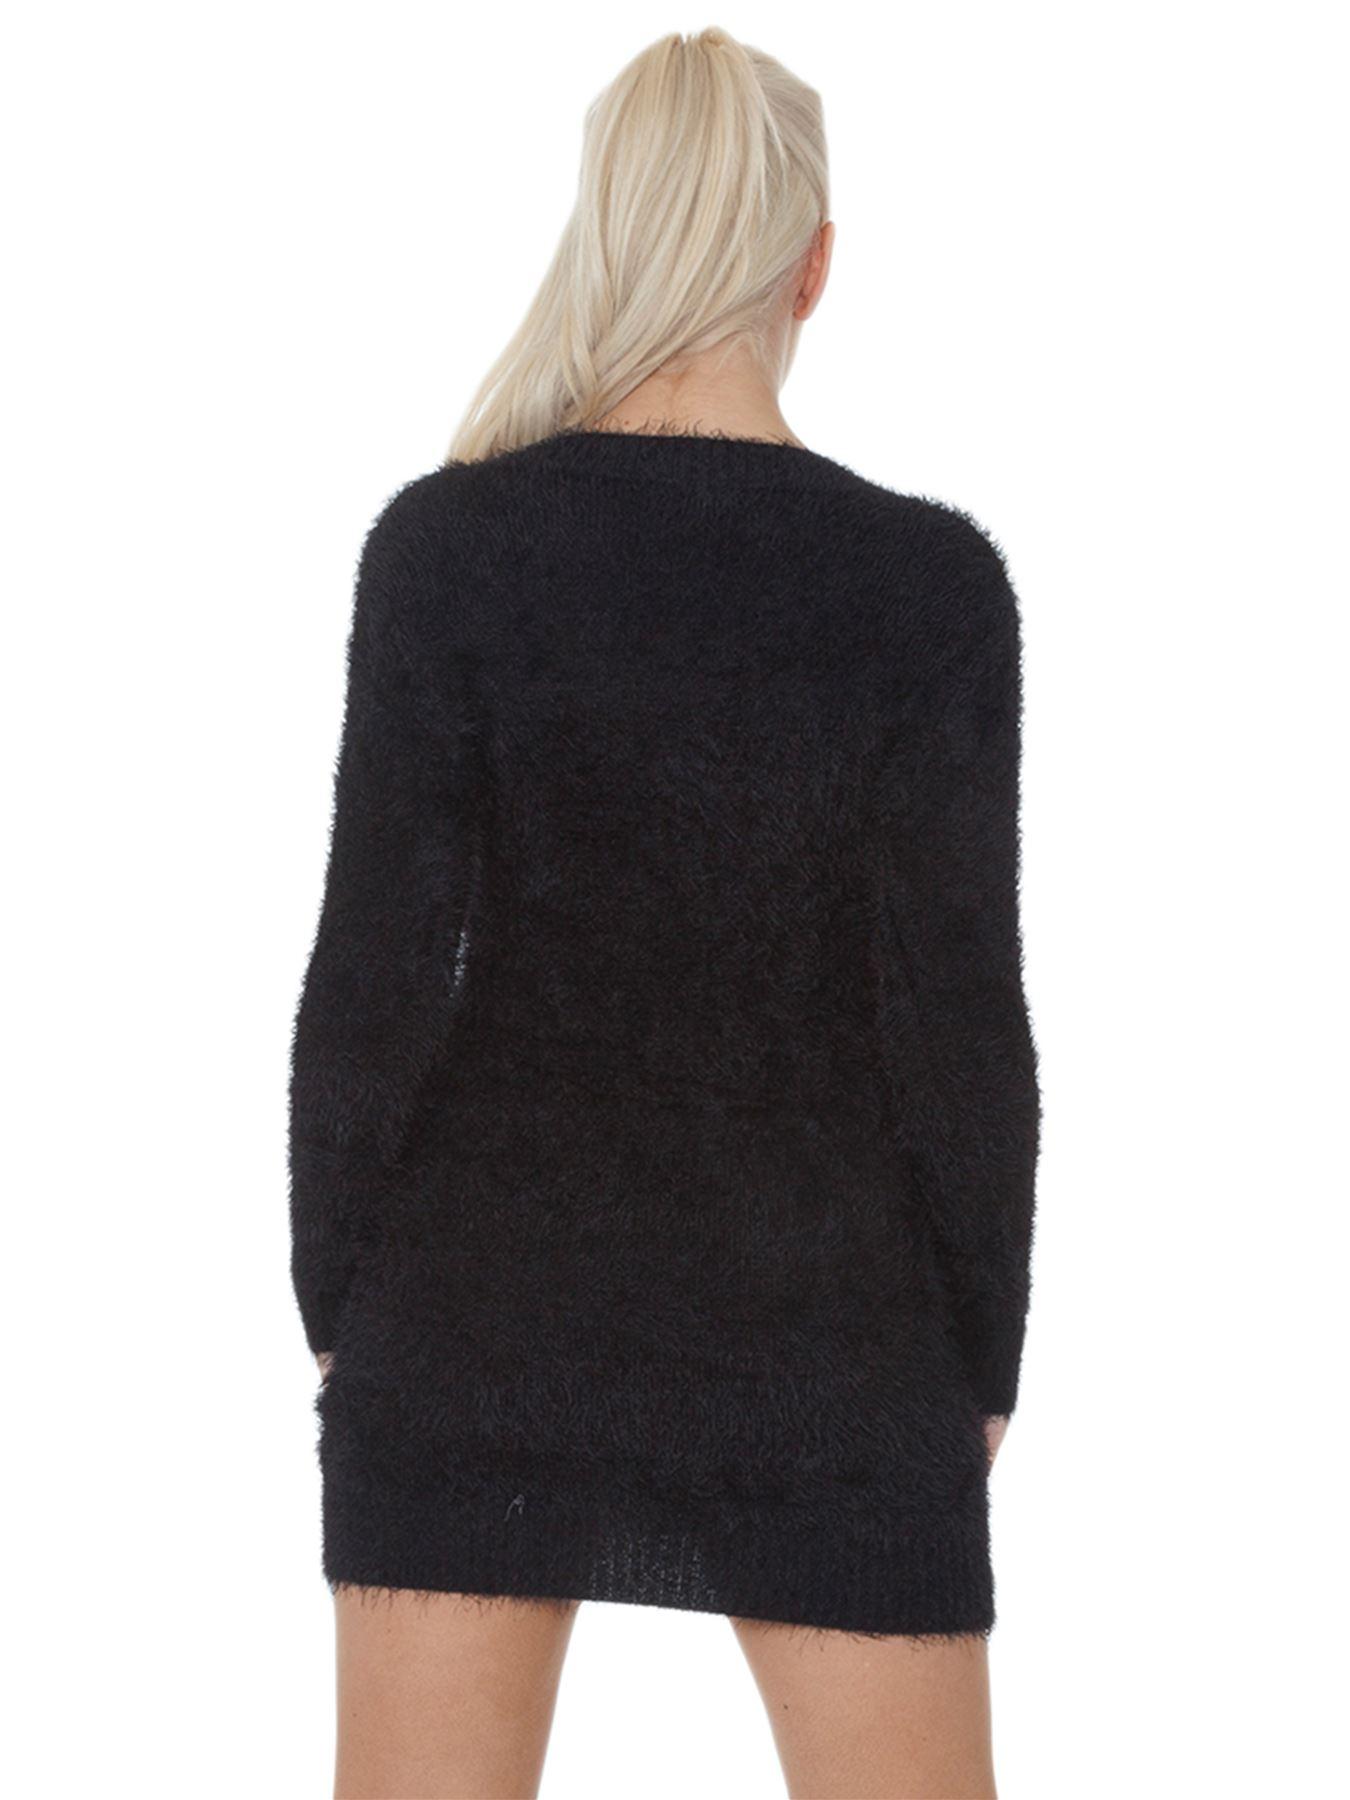 Pull-Femme-Femmes-Tricote-Cardigans-Plain-Tricot-Moelleux-Col-V-Manches-Longues miniature 10